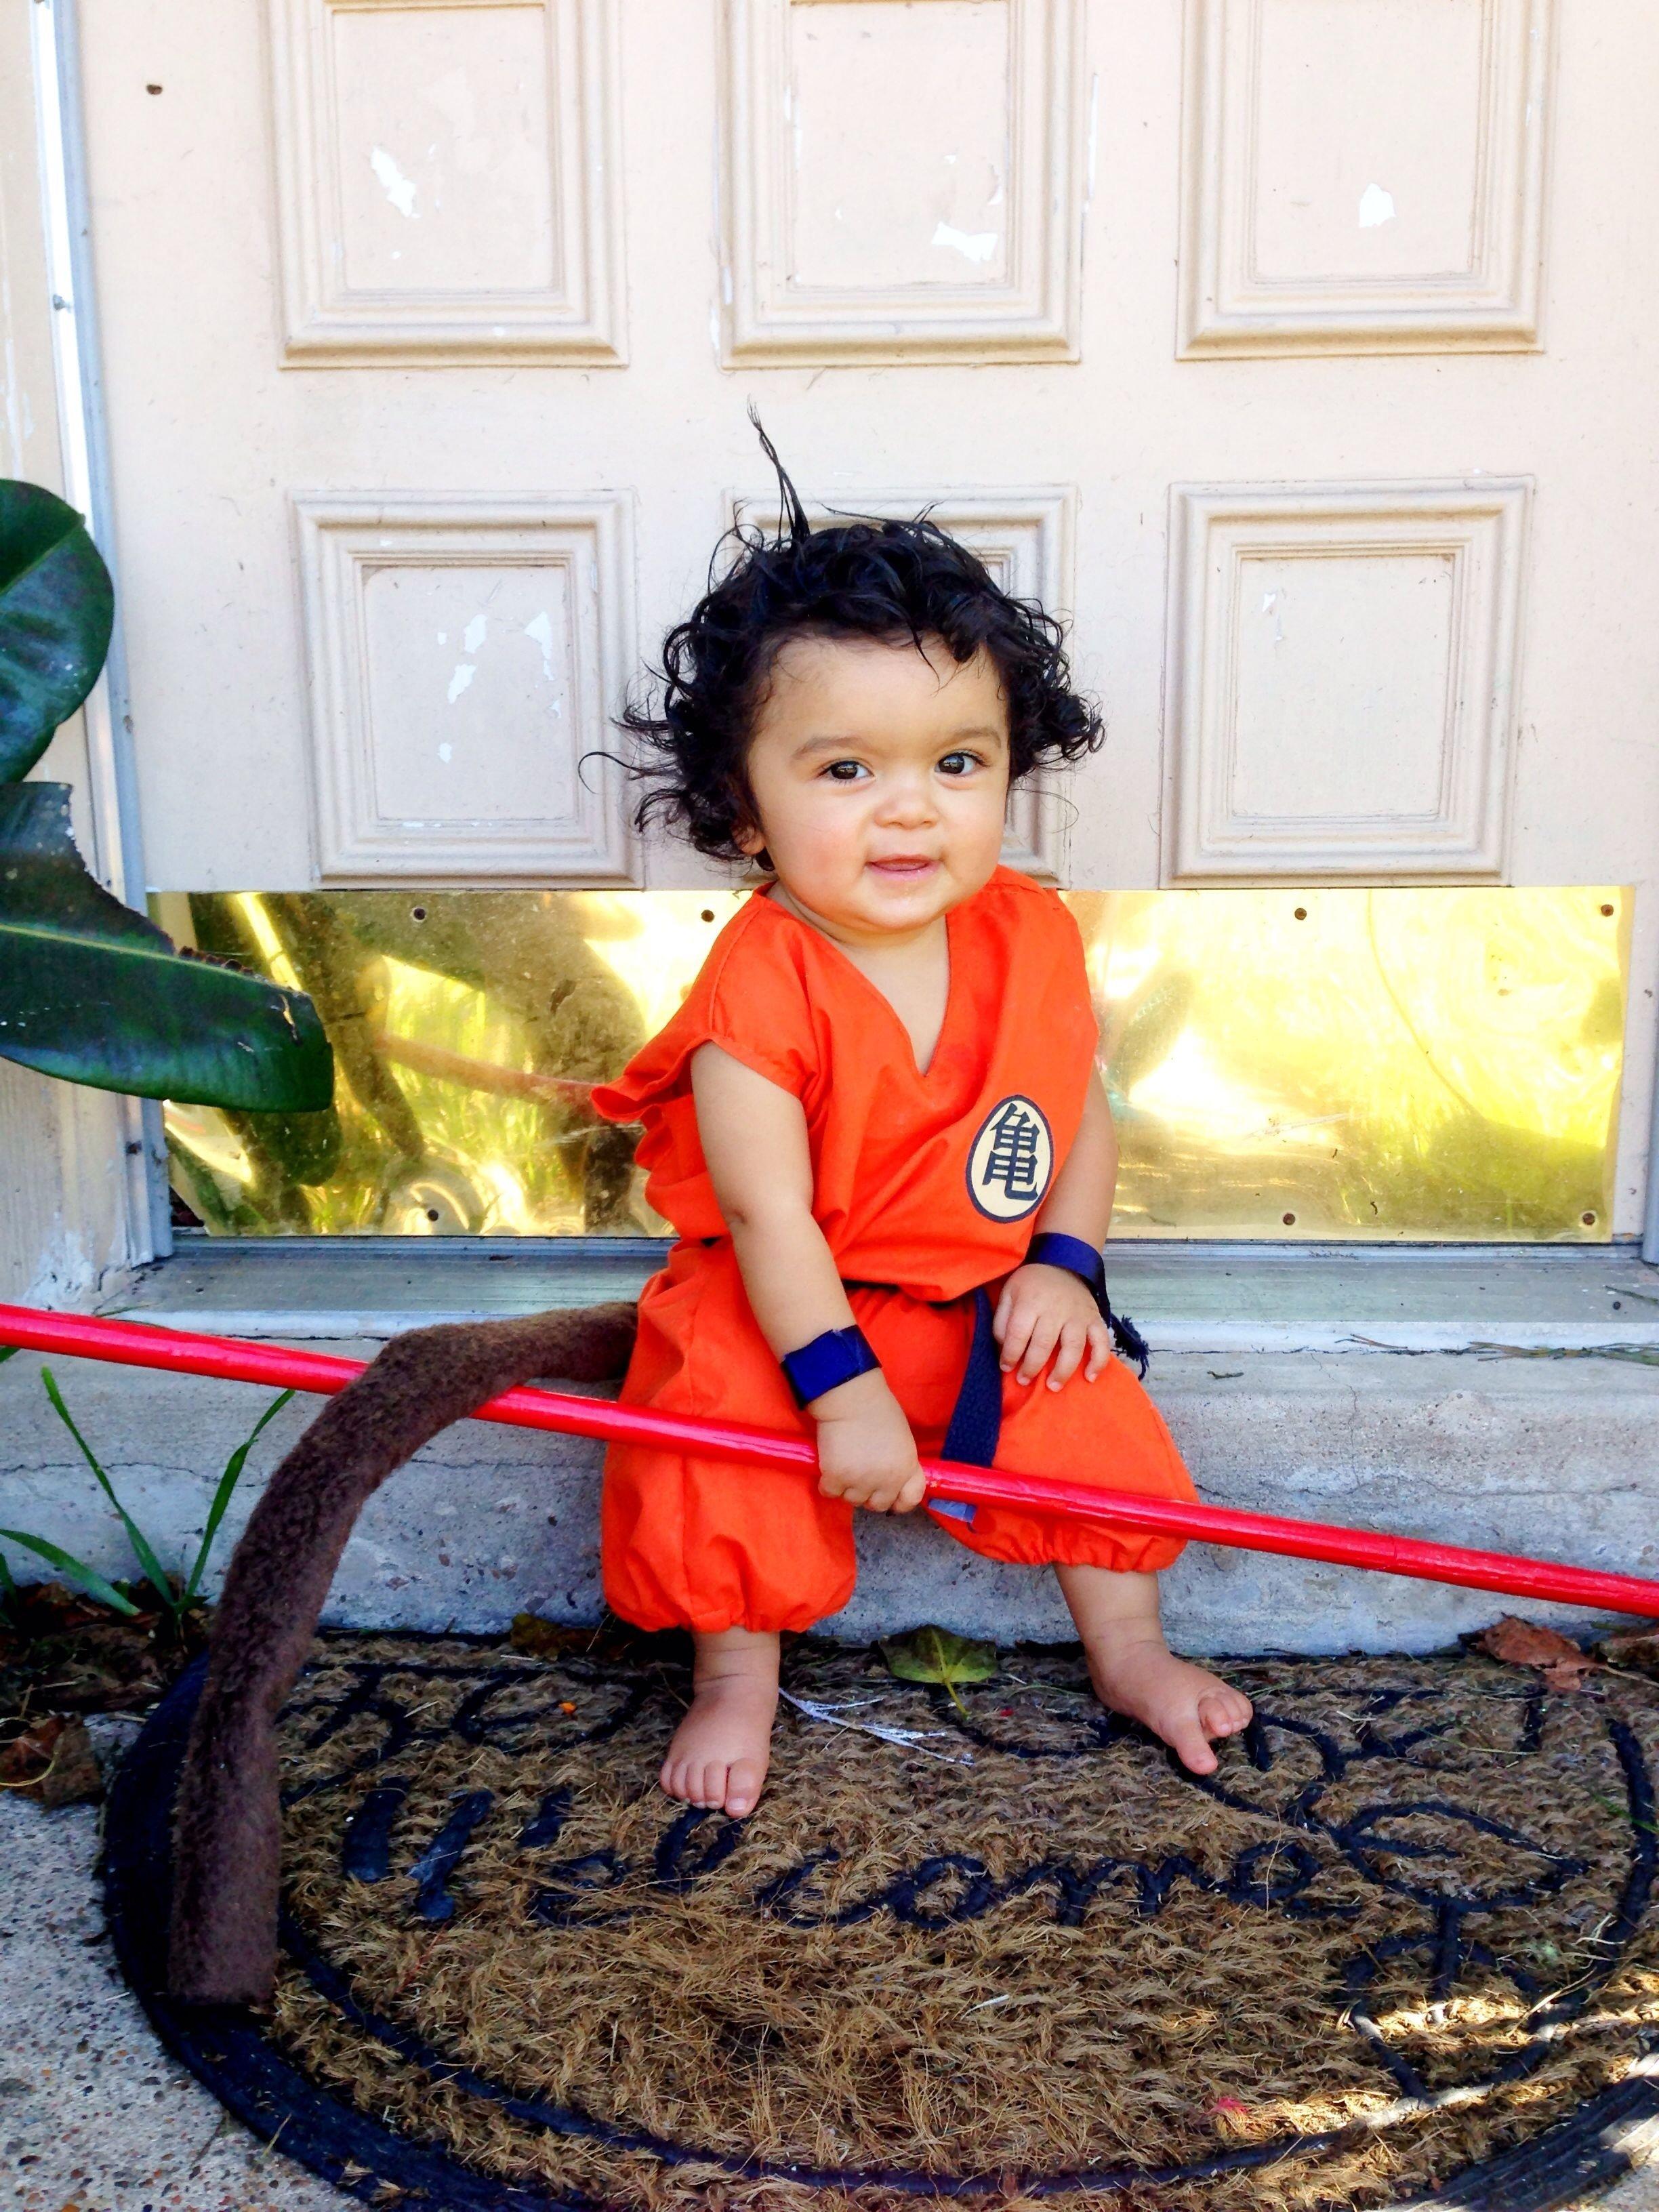 10 Attractive Baby Costume Ideas For Boys dragonball cosplay comic con goku baby goku goku costume baby 2020